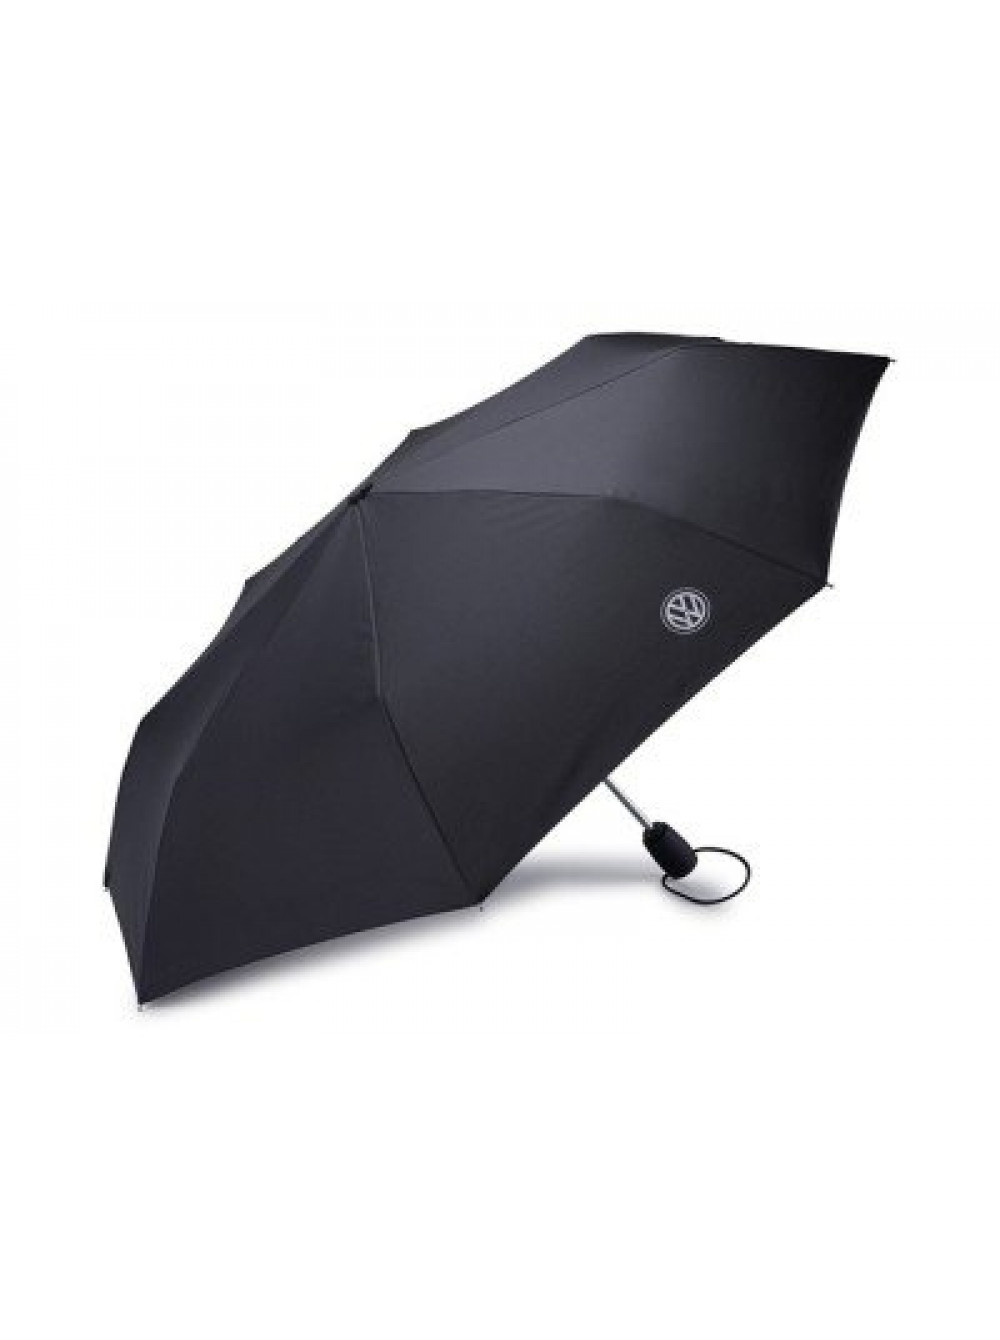 Складной зонт Volkswagen Votex VAG 000087602K